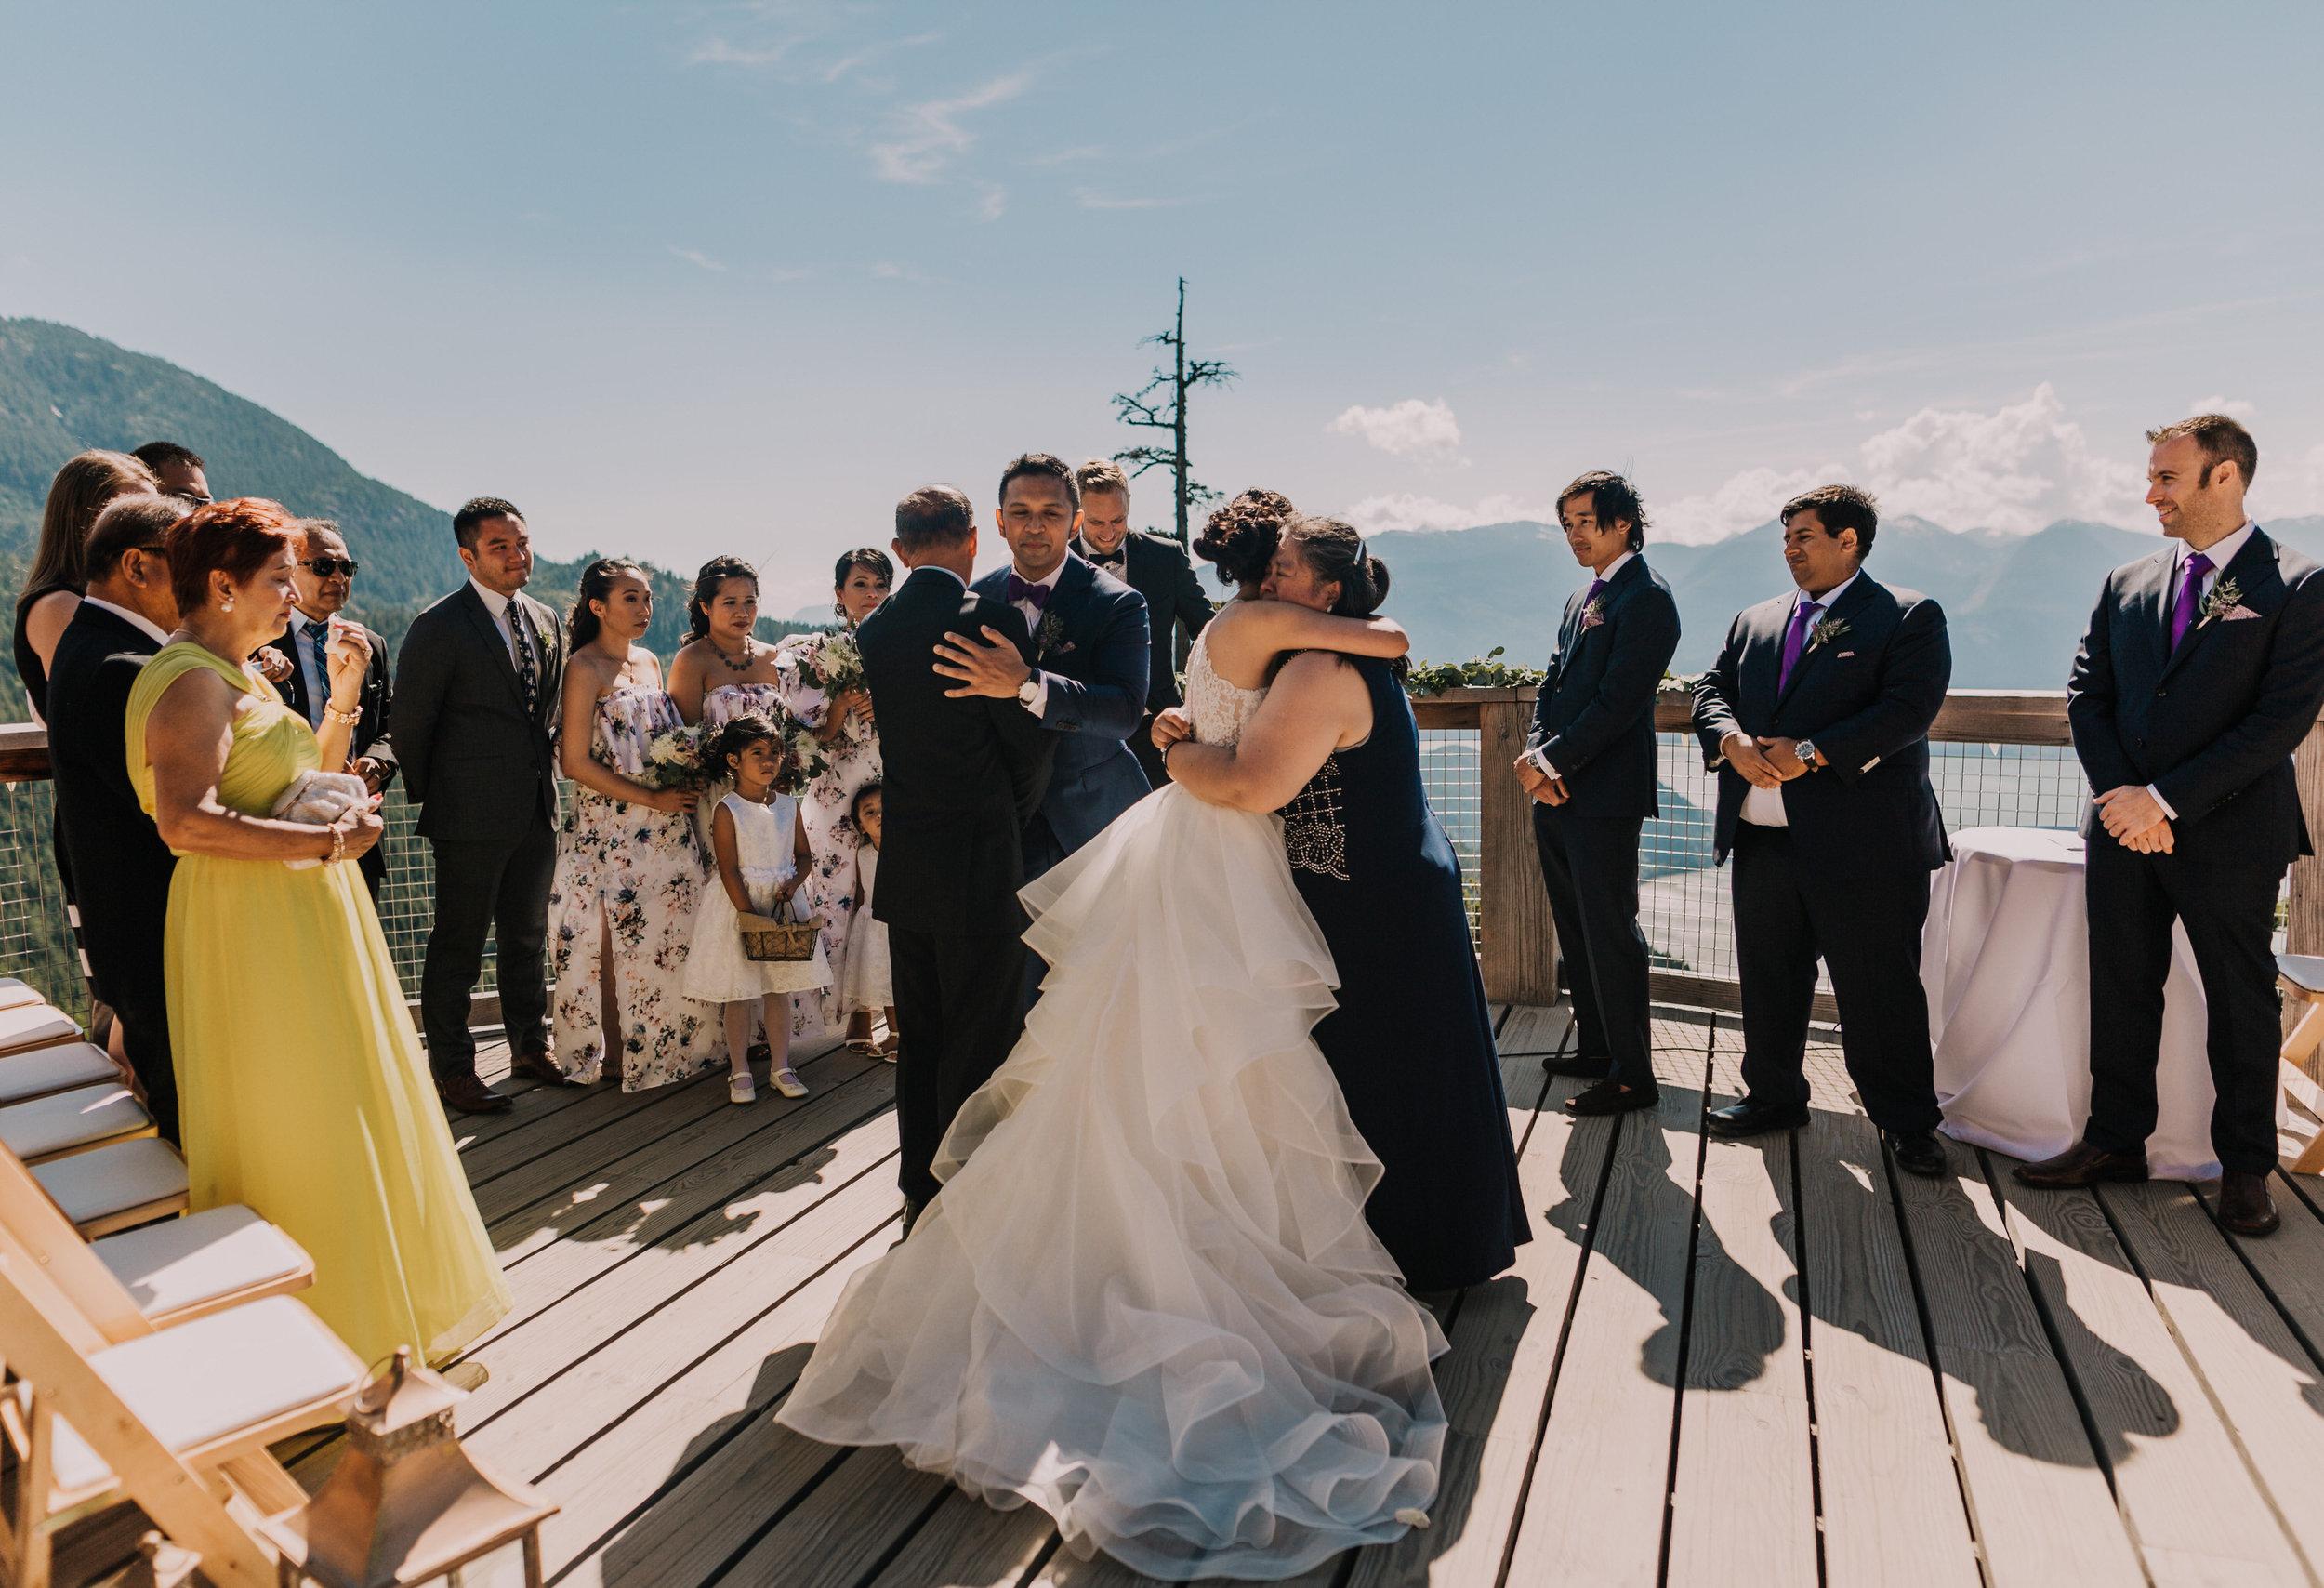 Squamish Wedding Photographer - Sea to Sky Gondola Wedding Photos -  Vancouver Wedding Photographer & Videographer - Sunshine Coast Wedding Photos - Sunshine Coast Wedding Photographer - Jennifer Picard Photography - IMG_3030.jpg